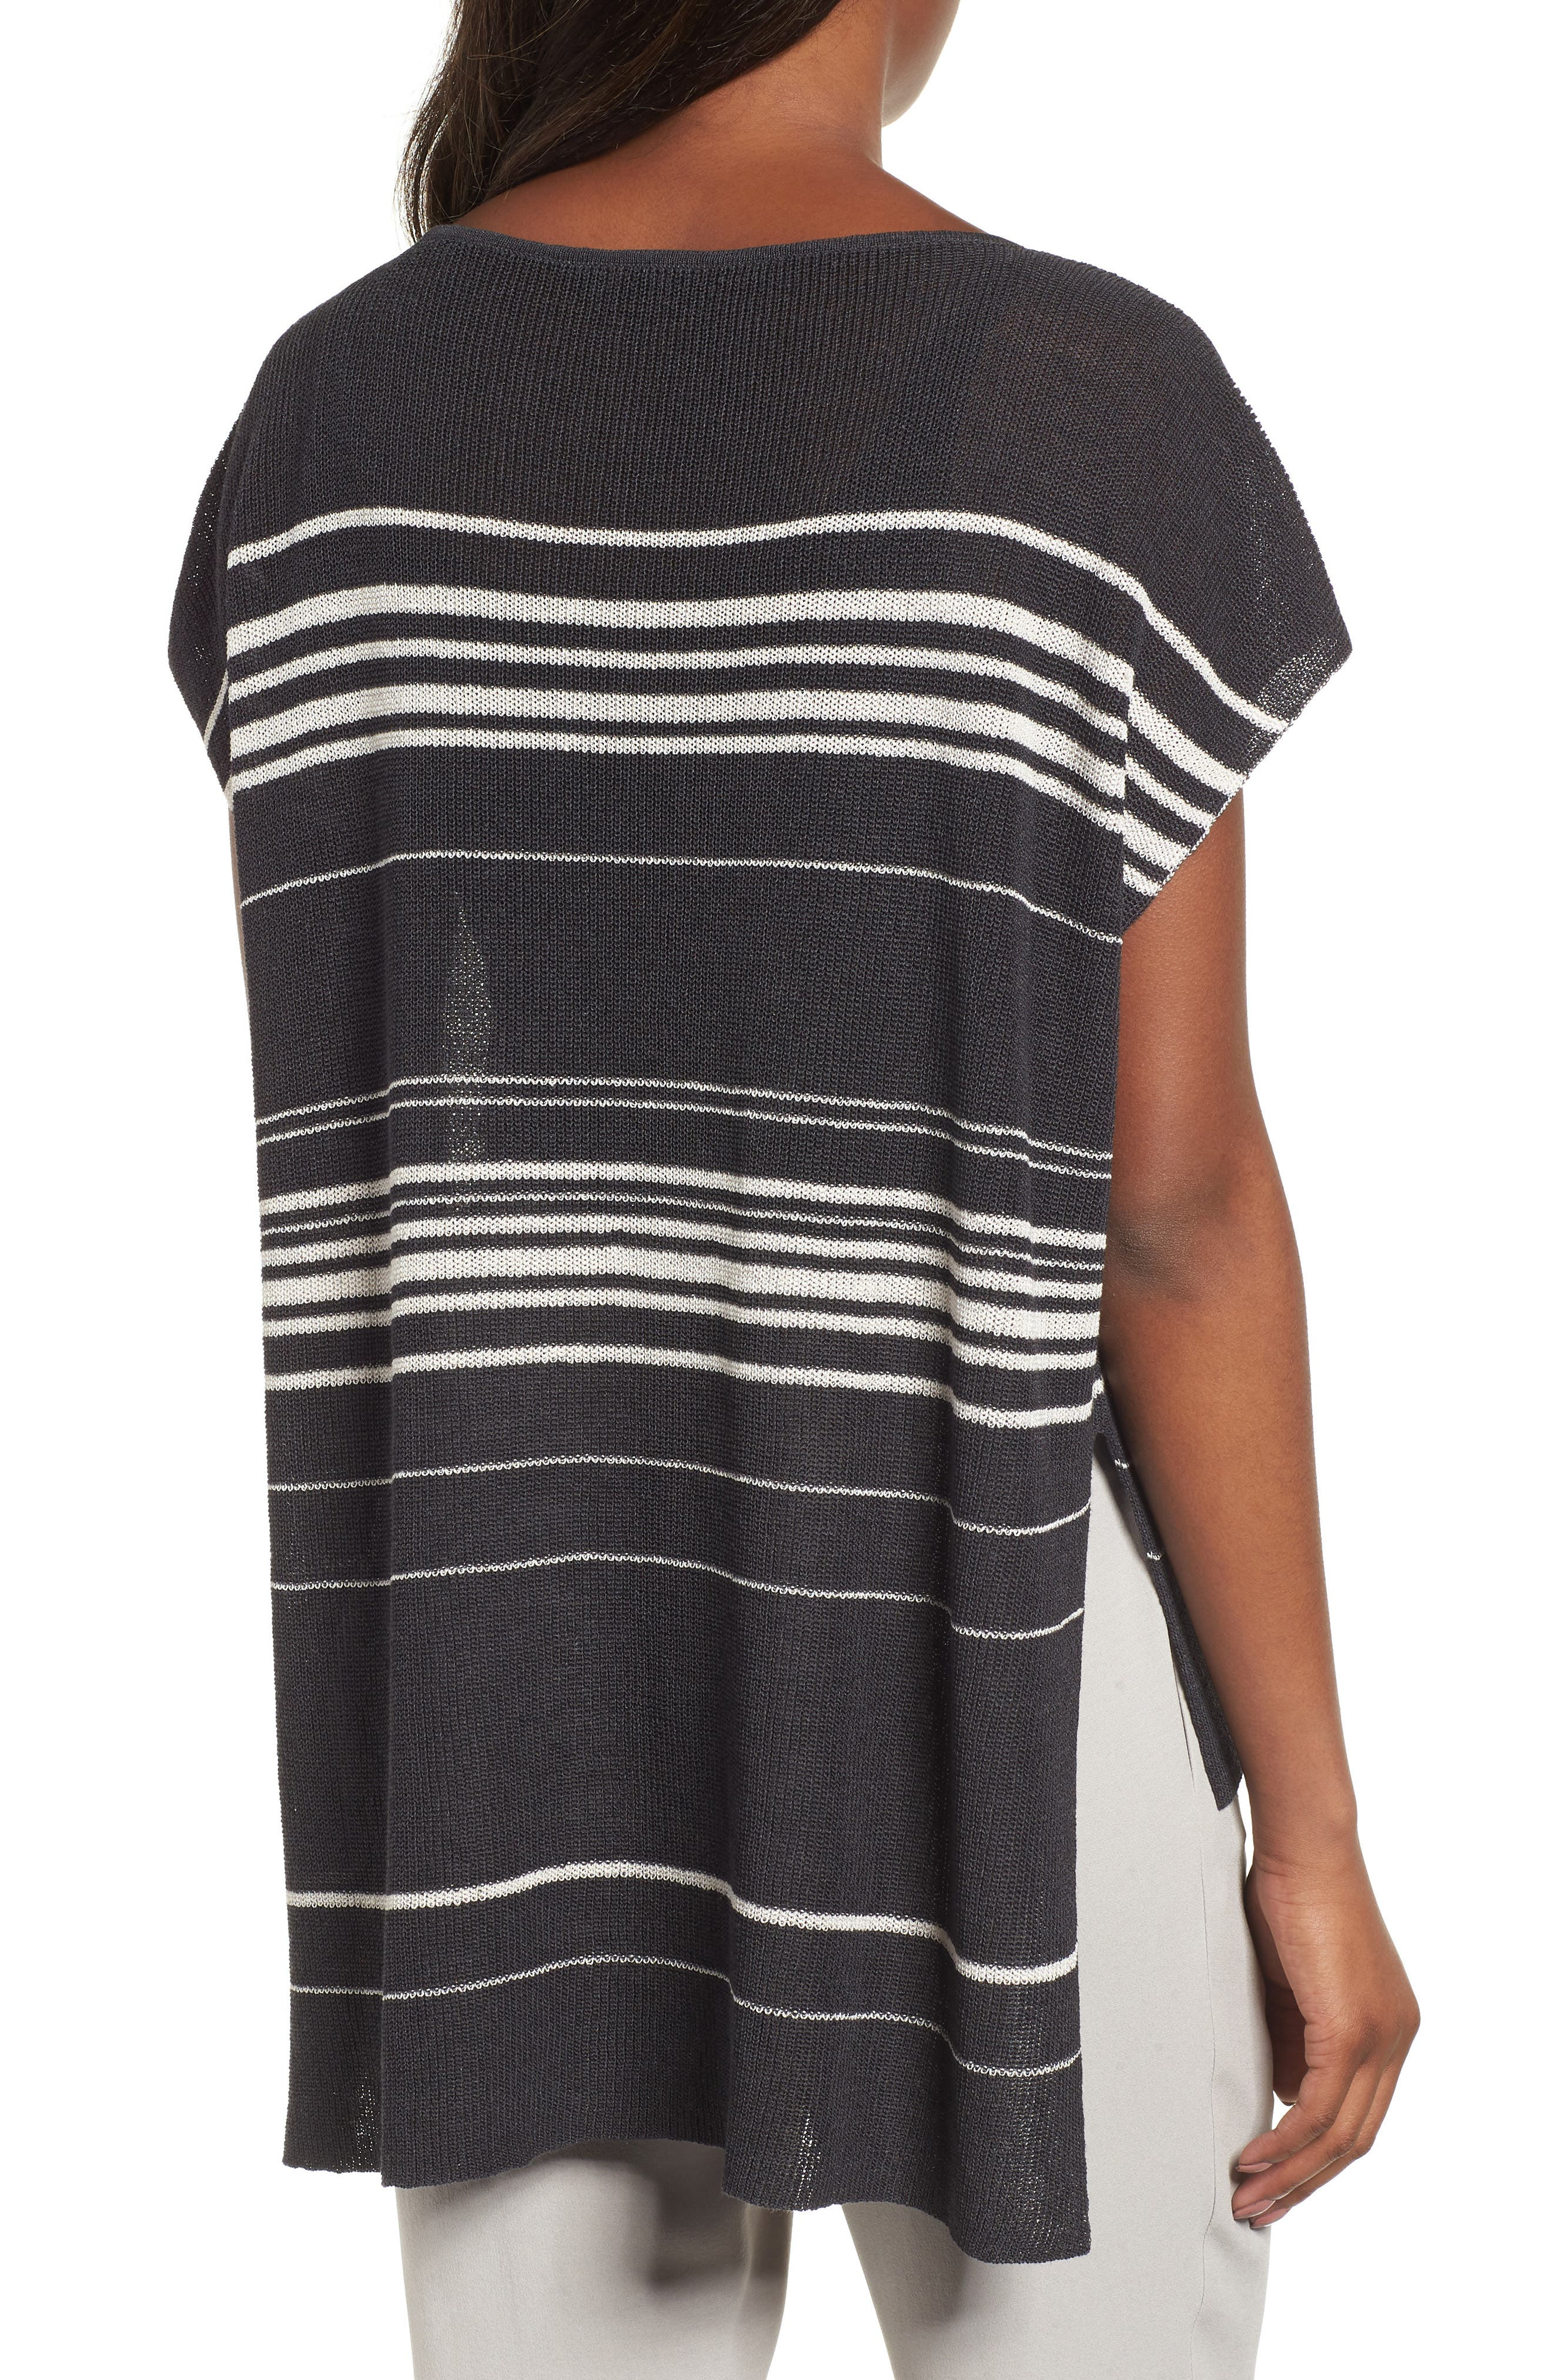 Organic Linen Blend Poncho Sweater,                             Alternate thumbnail 2, color,                             Graphite/ Bone